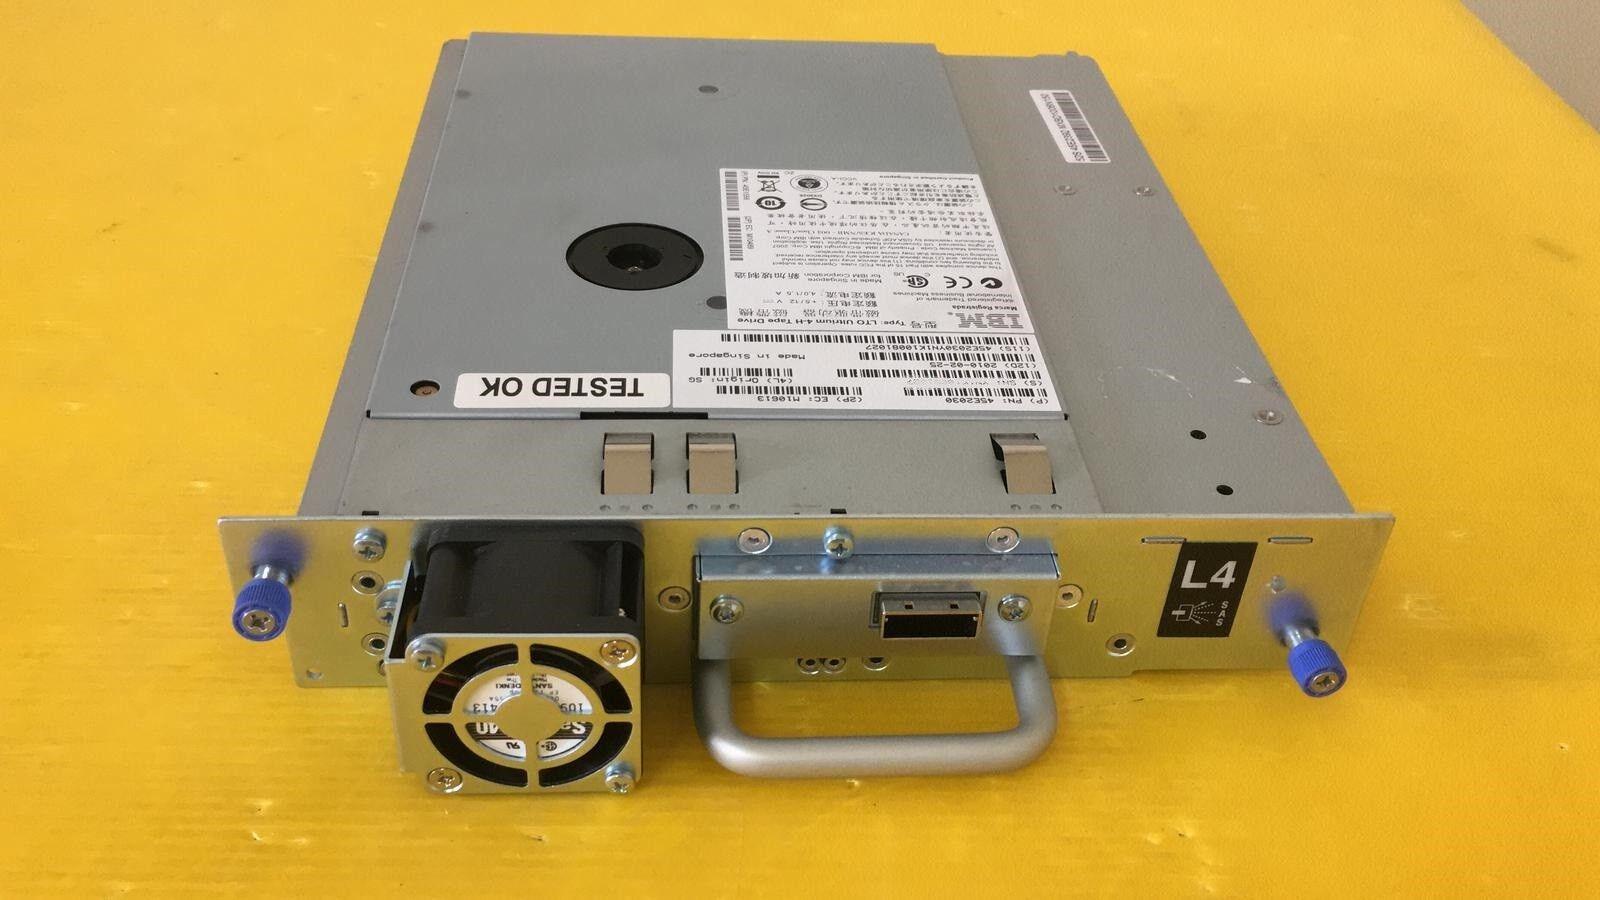 IBM 45E2030 800 1600GB Ultrium LTO-4 TAPE DRIVE YAS3 PULLED FROM IBM 3573 2UL